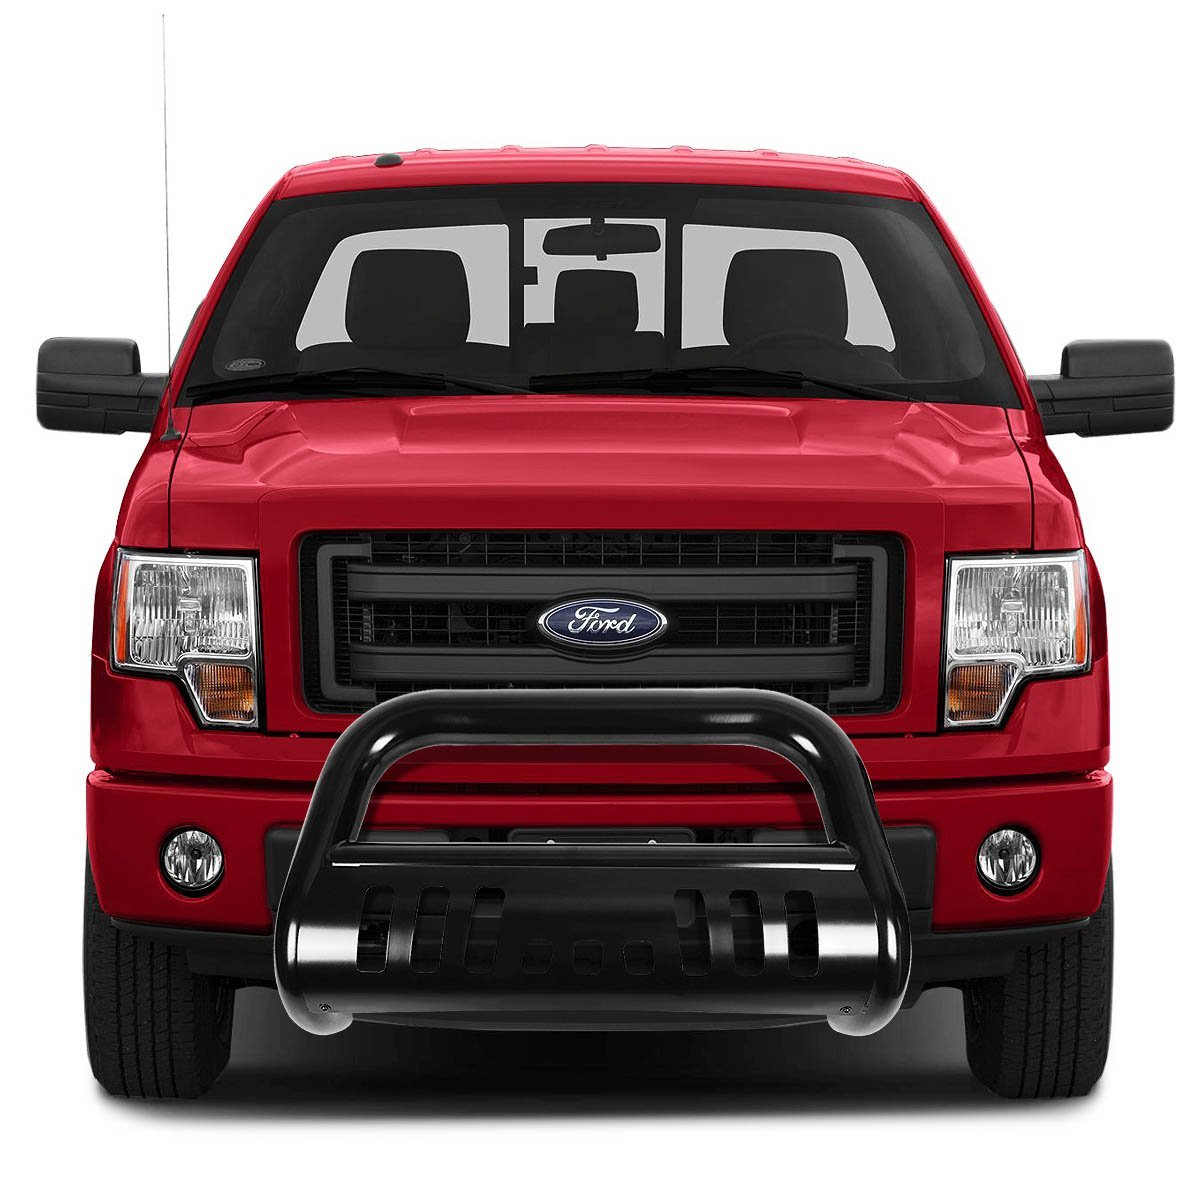 For 08-10 Ford F250SD F350SD F450SD BURB-013-BK DNA Motoring BURB013BK 3 Front Bumper Push Bull Bar